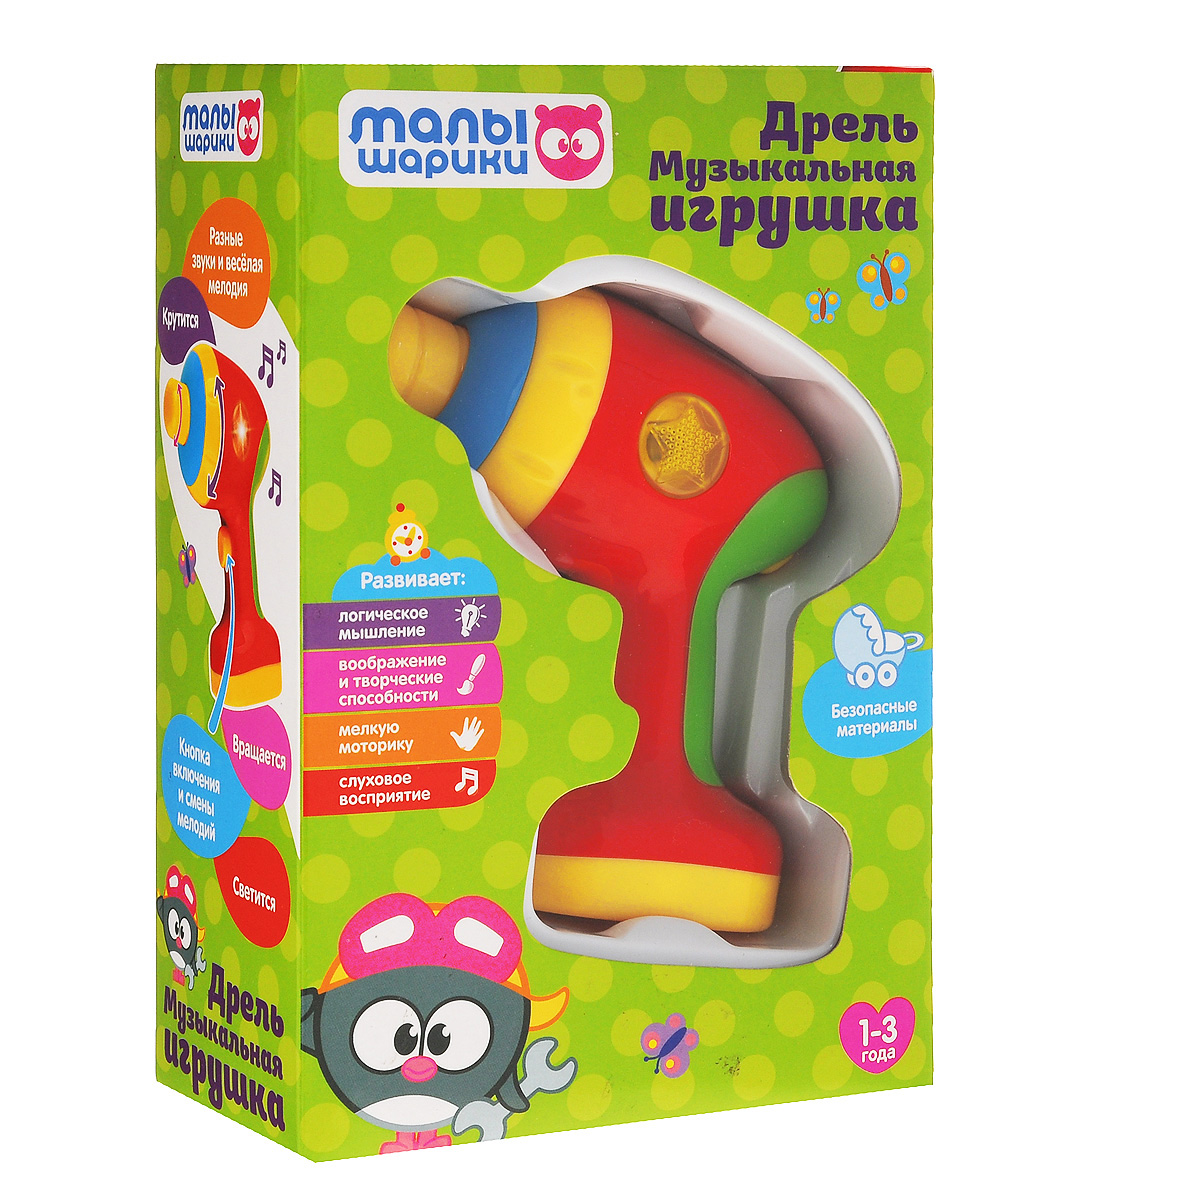 дрель игрушка со звуком